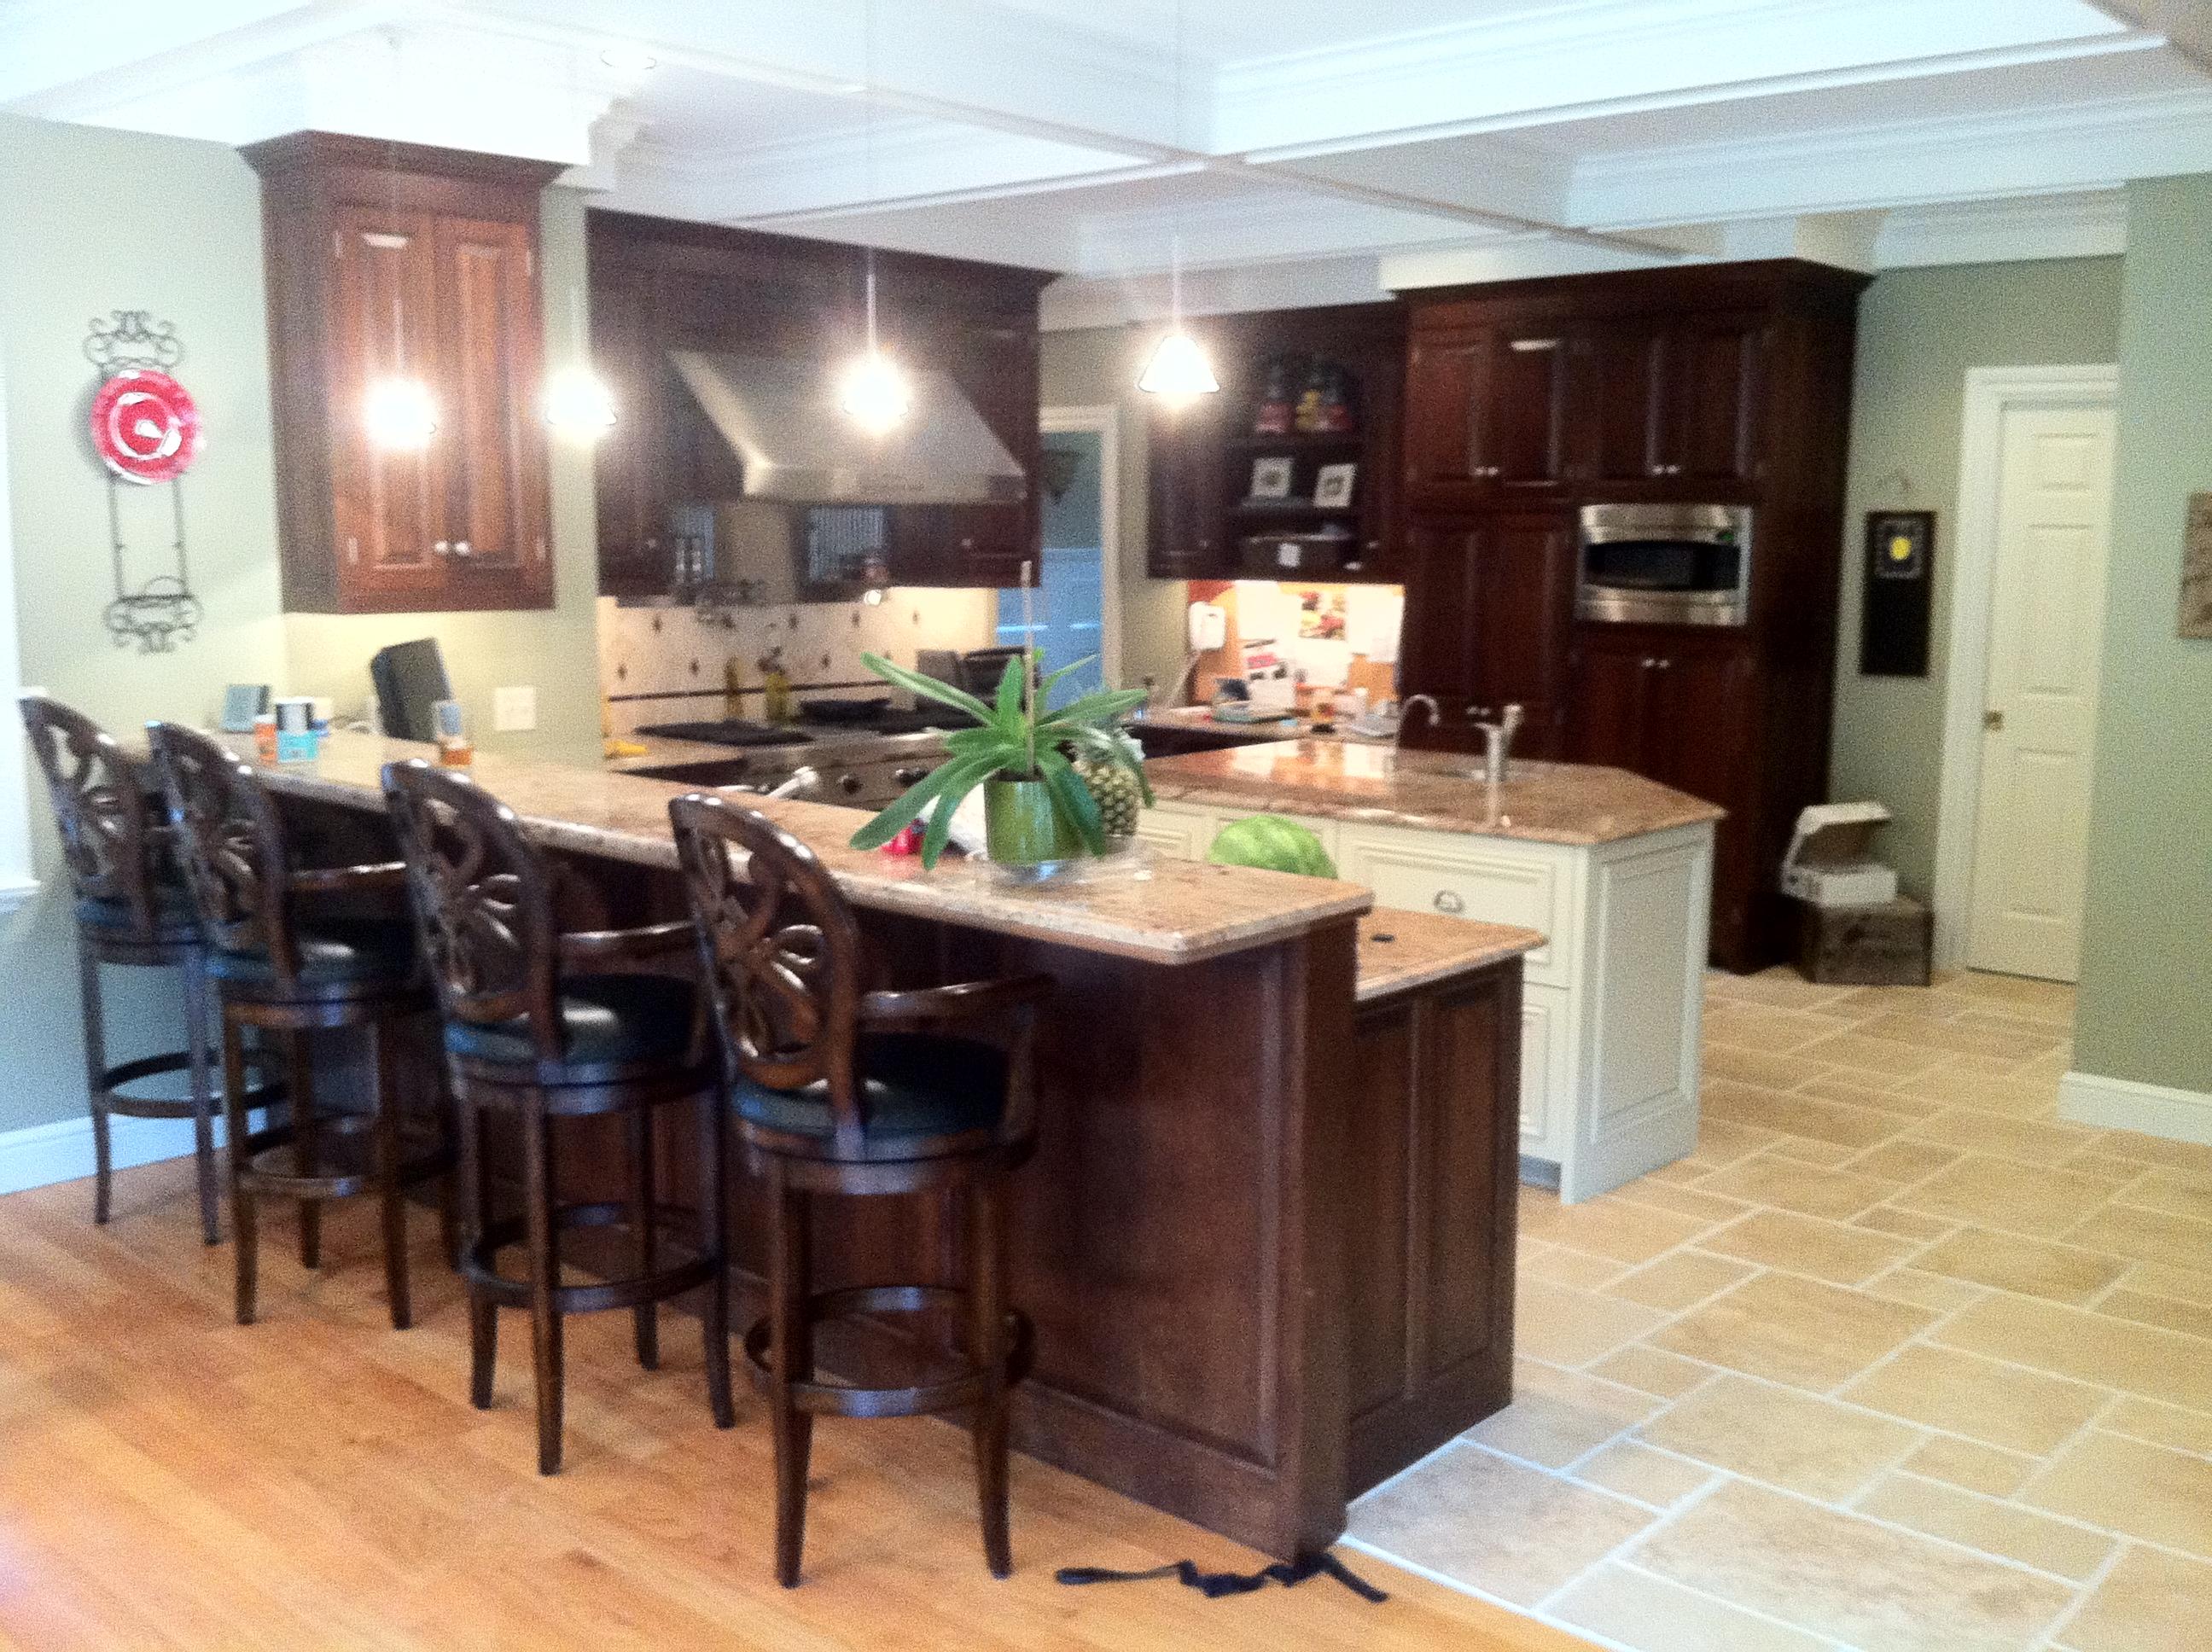 Kitchen cabinets rhode island - Cabinet Refinishing In Kingston Rhode Island Kitchen Remodeling